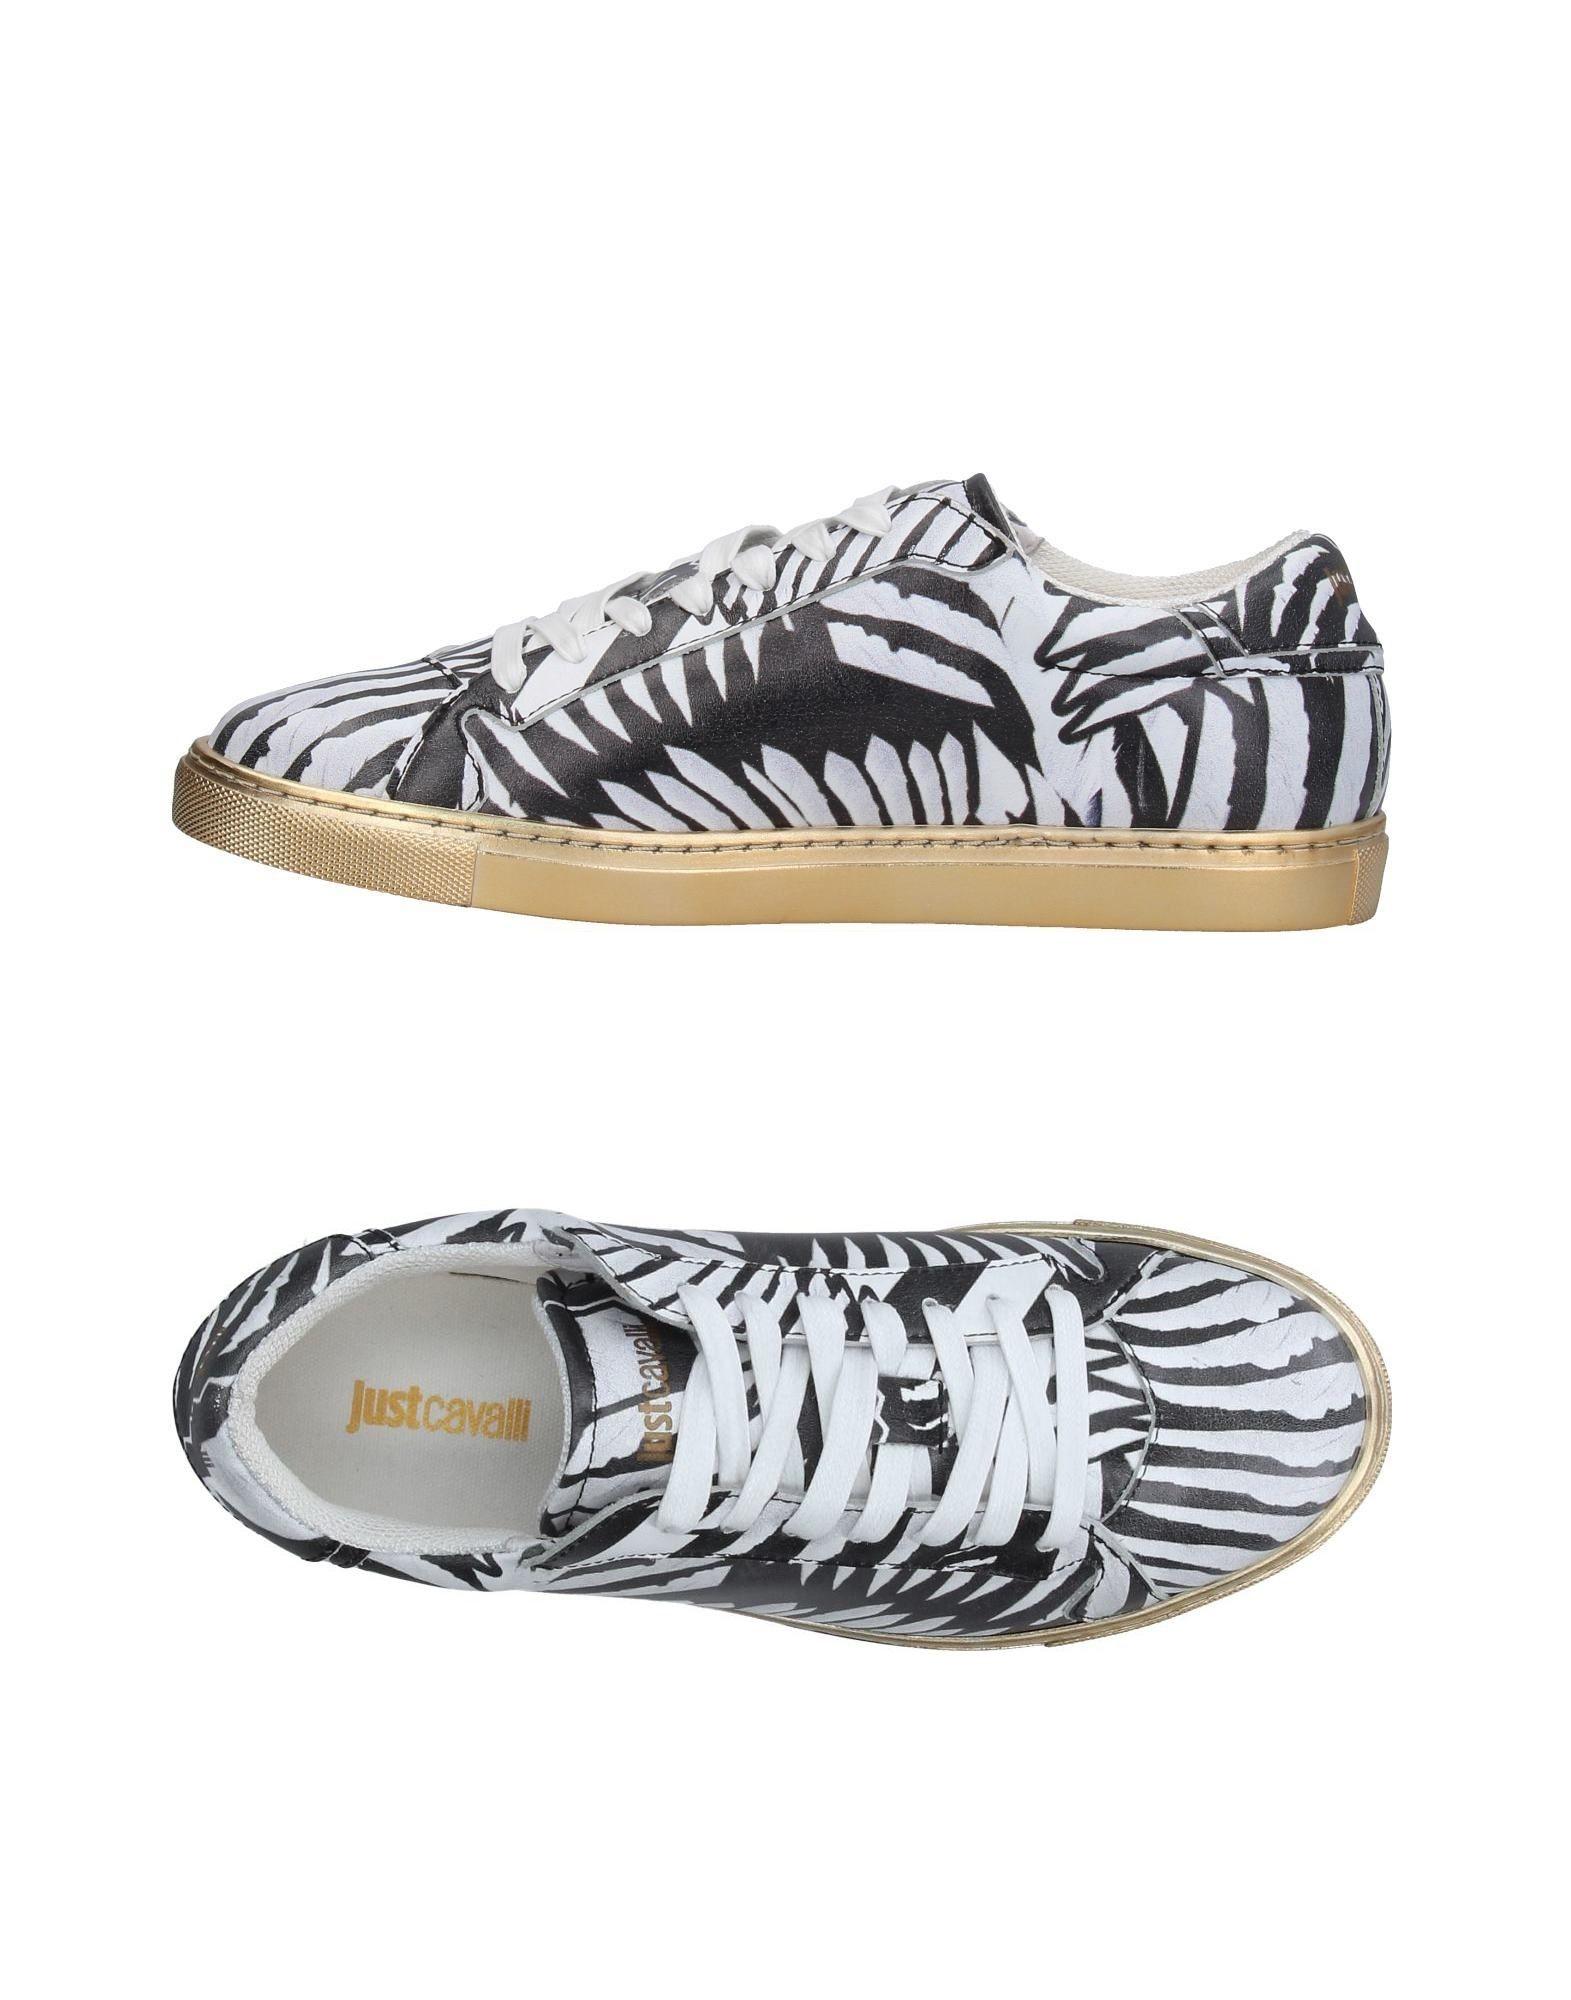 Just Cavalli Sneakers Damen  11355295RB Gute Qualität beliebte Schuhe